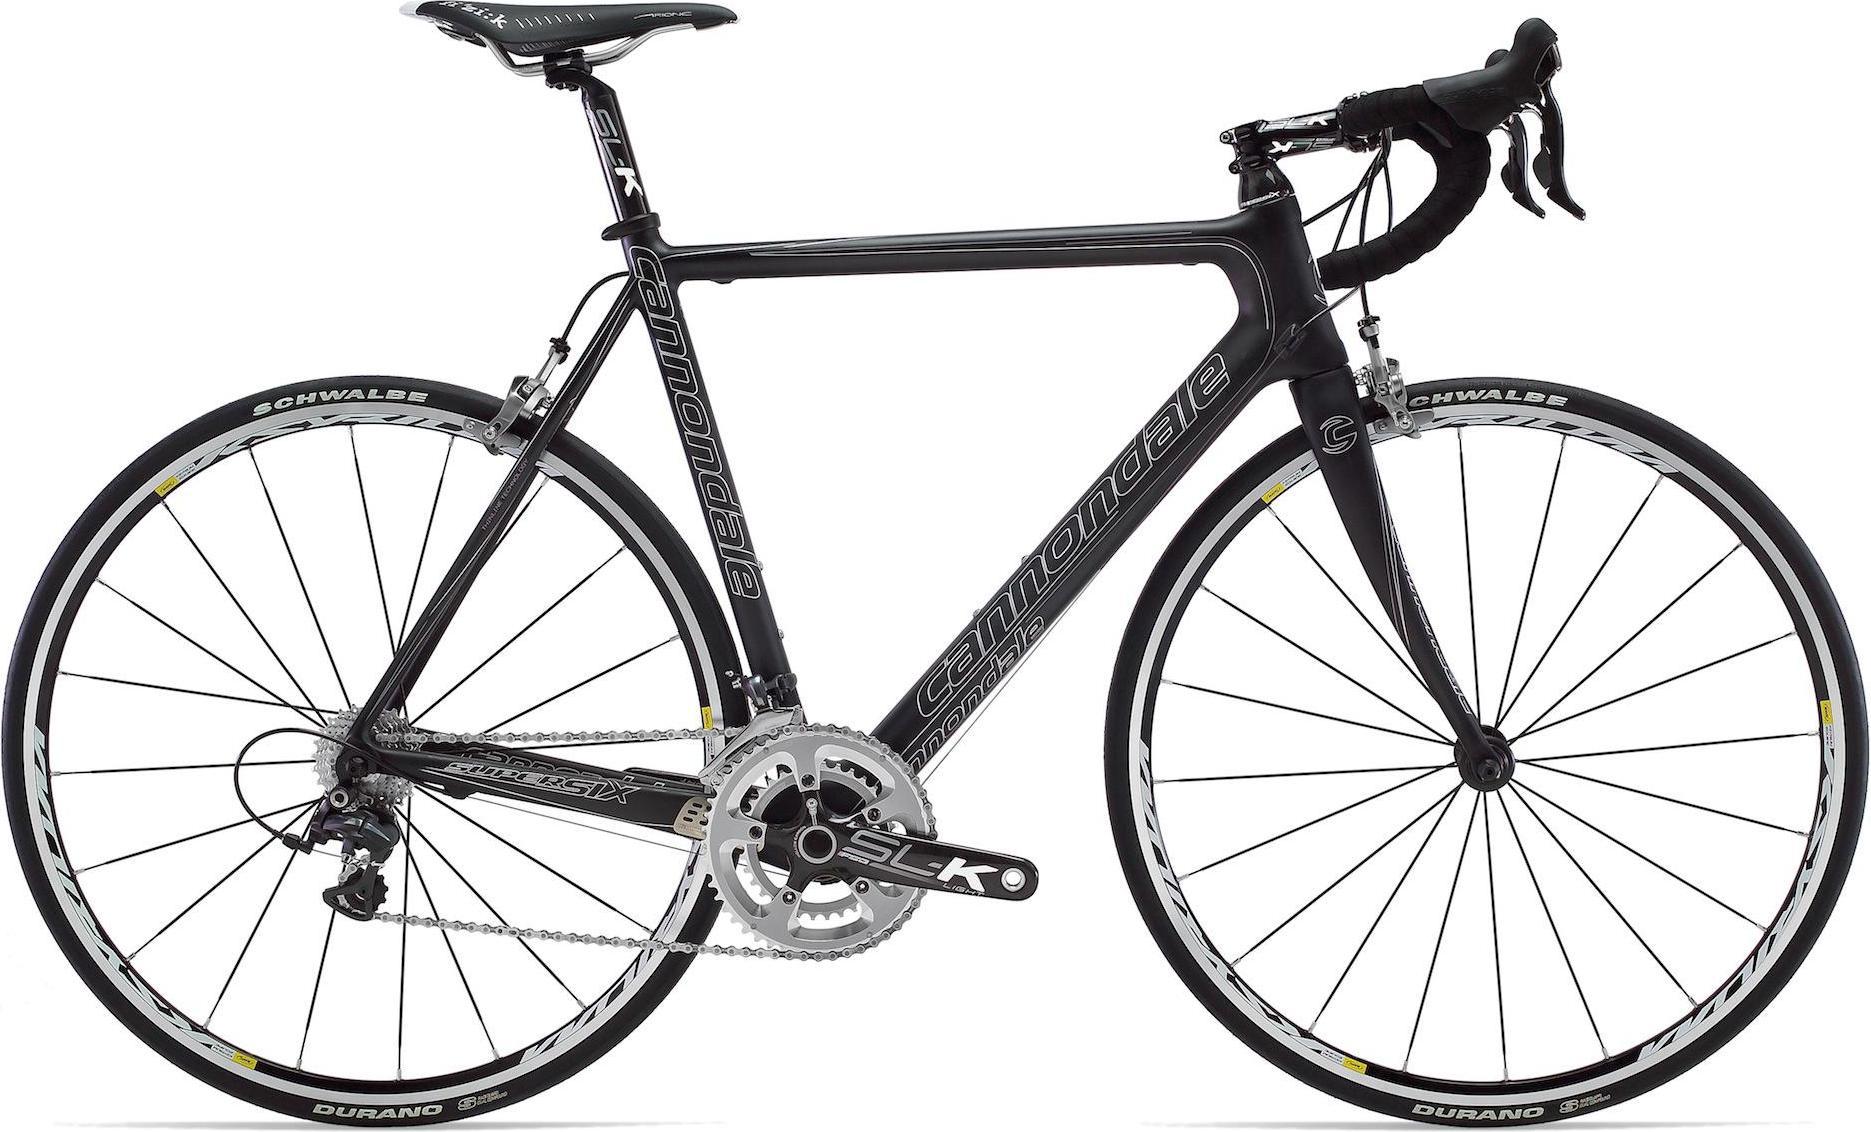 2011 Cannondale M SuperSix 5 105 Carbon Road Bike (newb ...